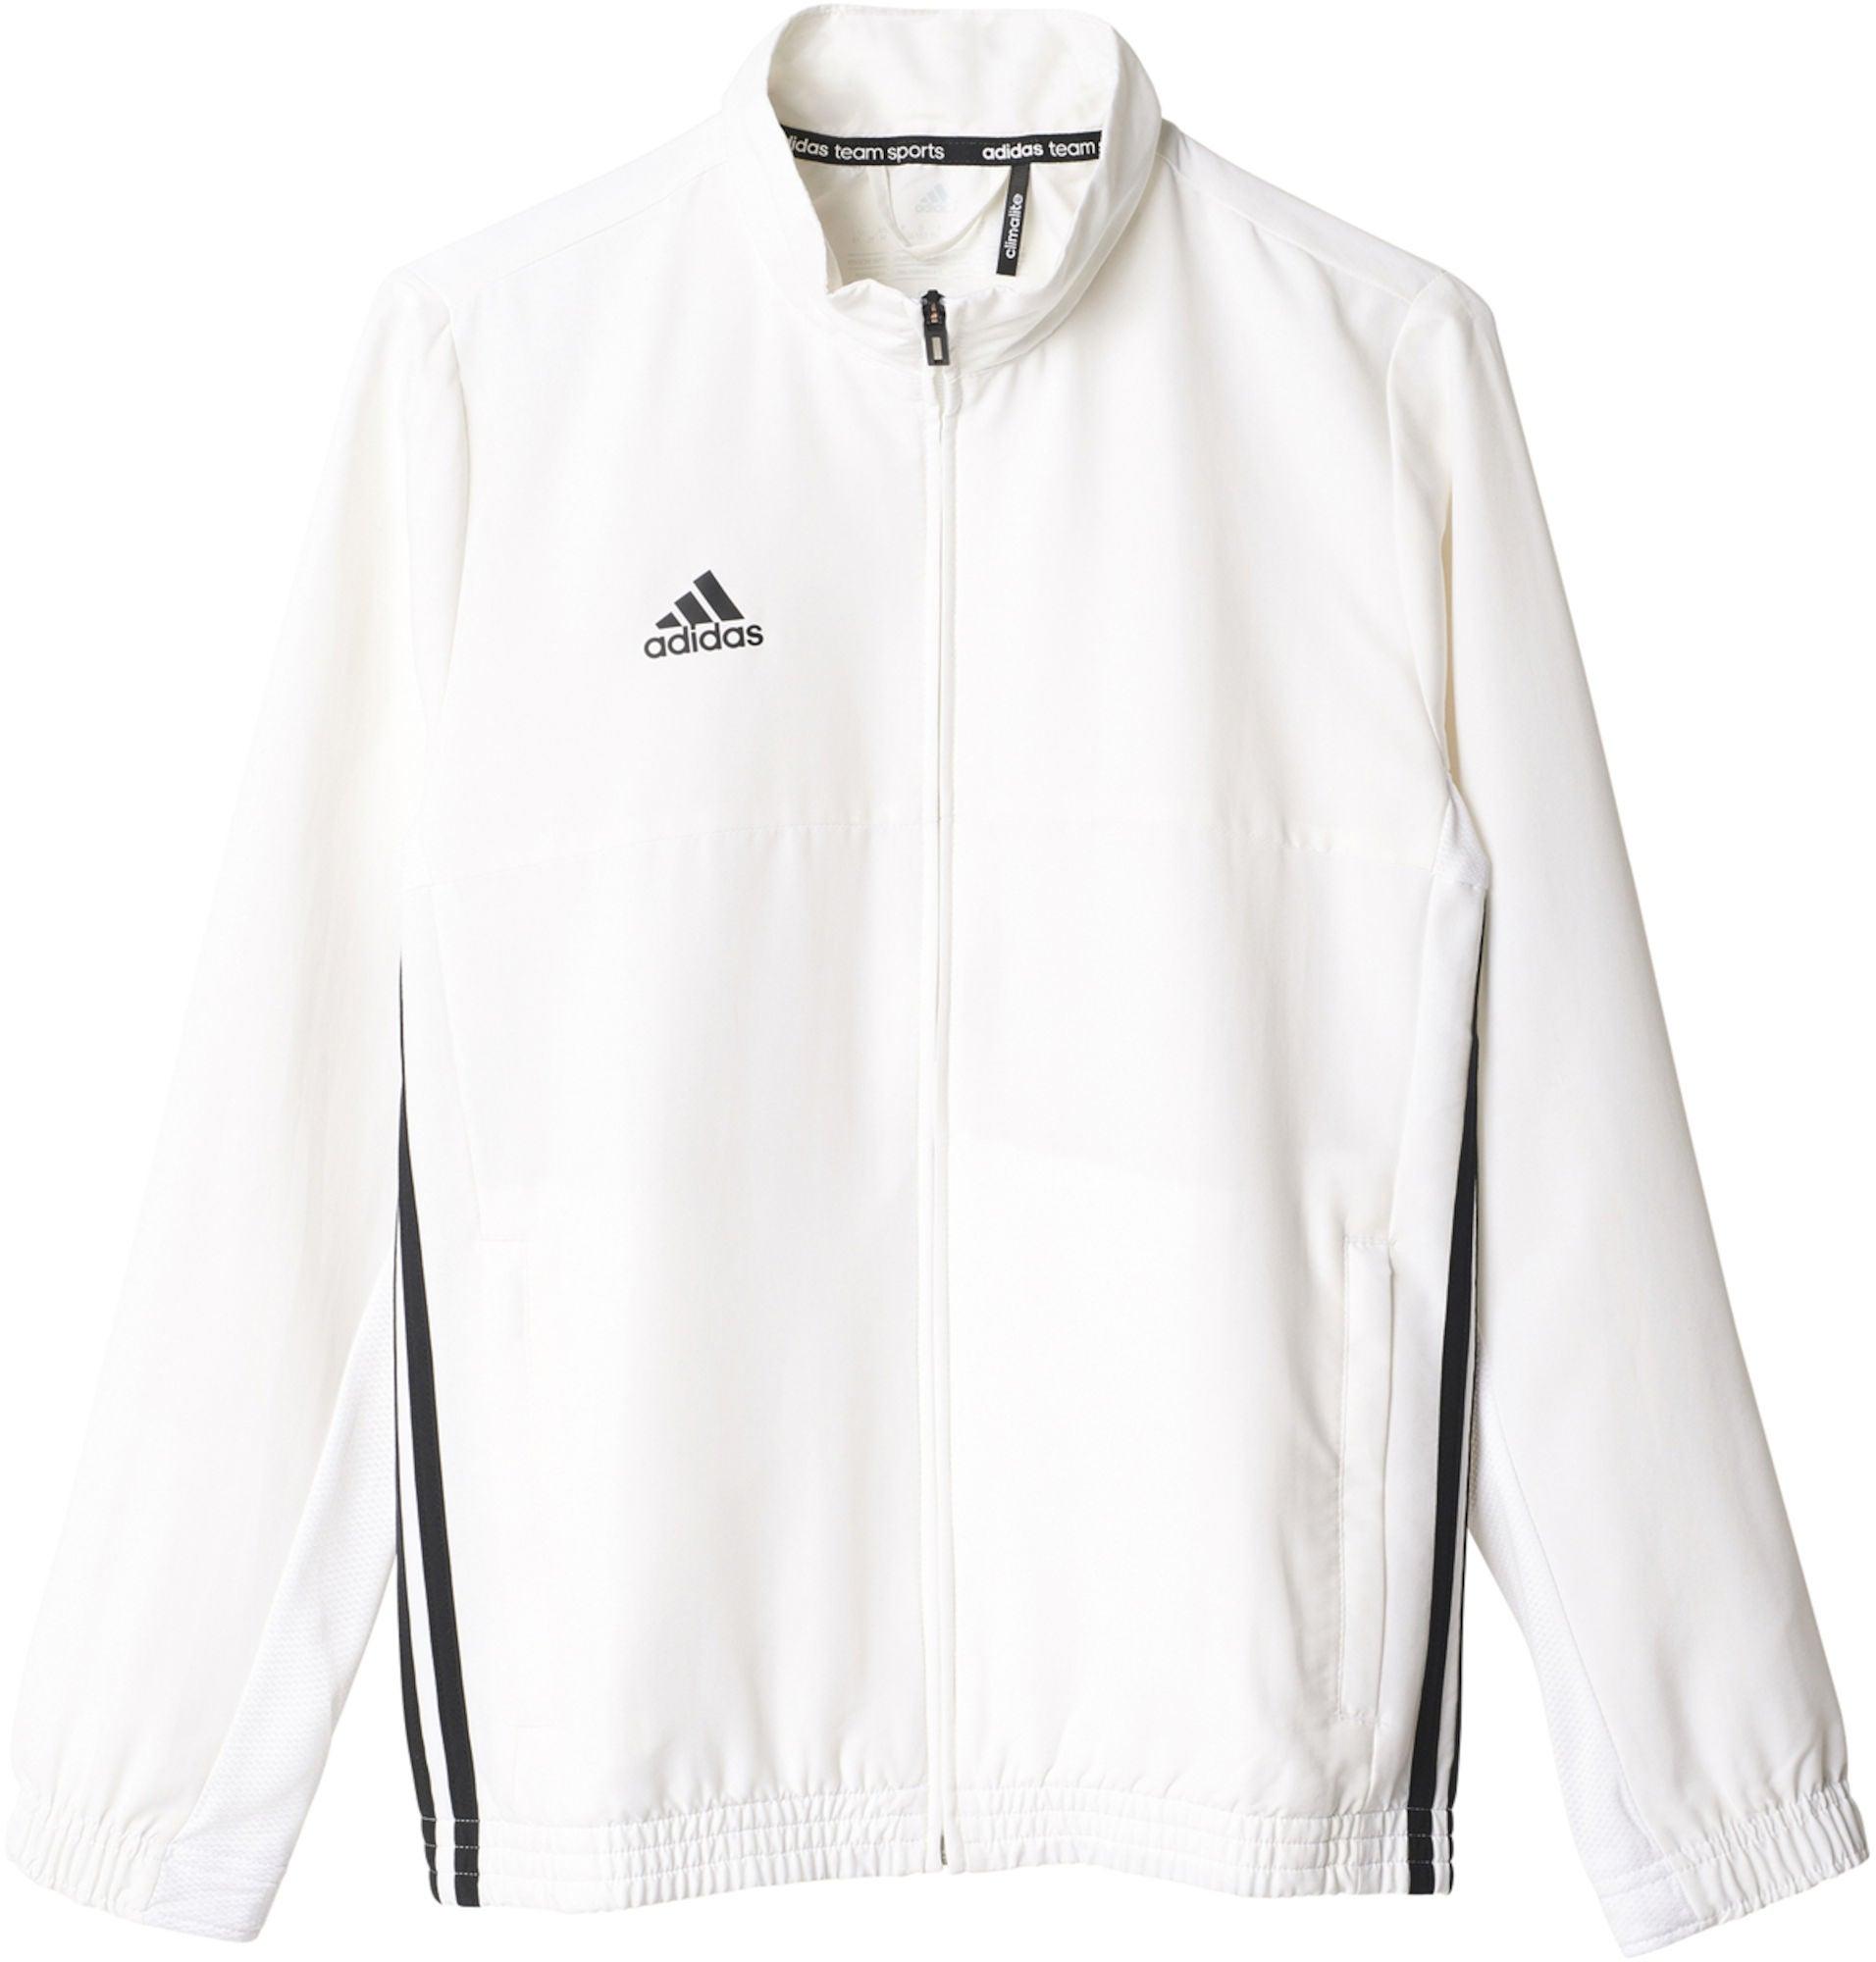 Kaufen Adidas T16 Team Jacket Y Trainingsjacke, White